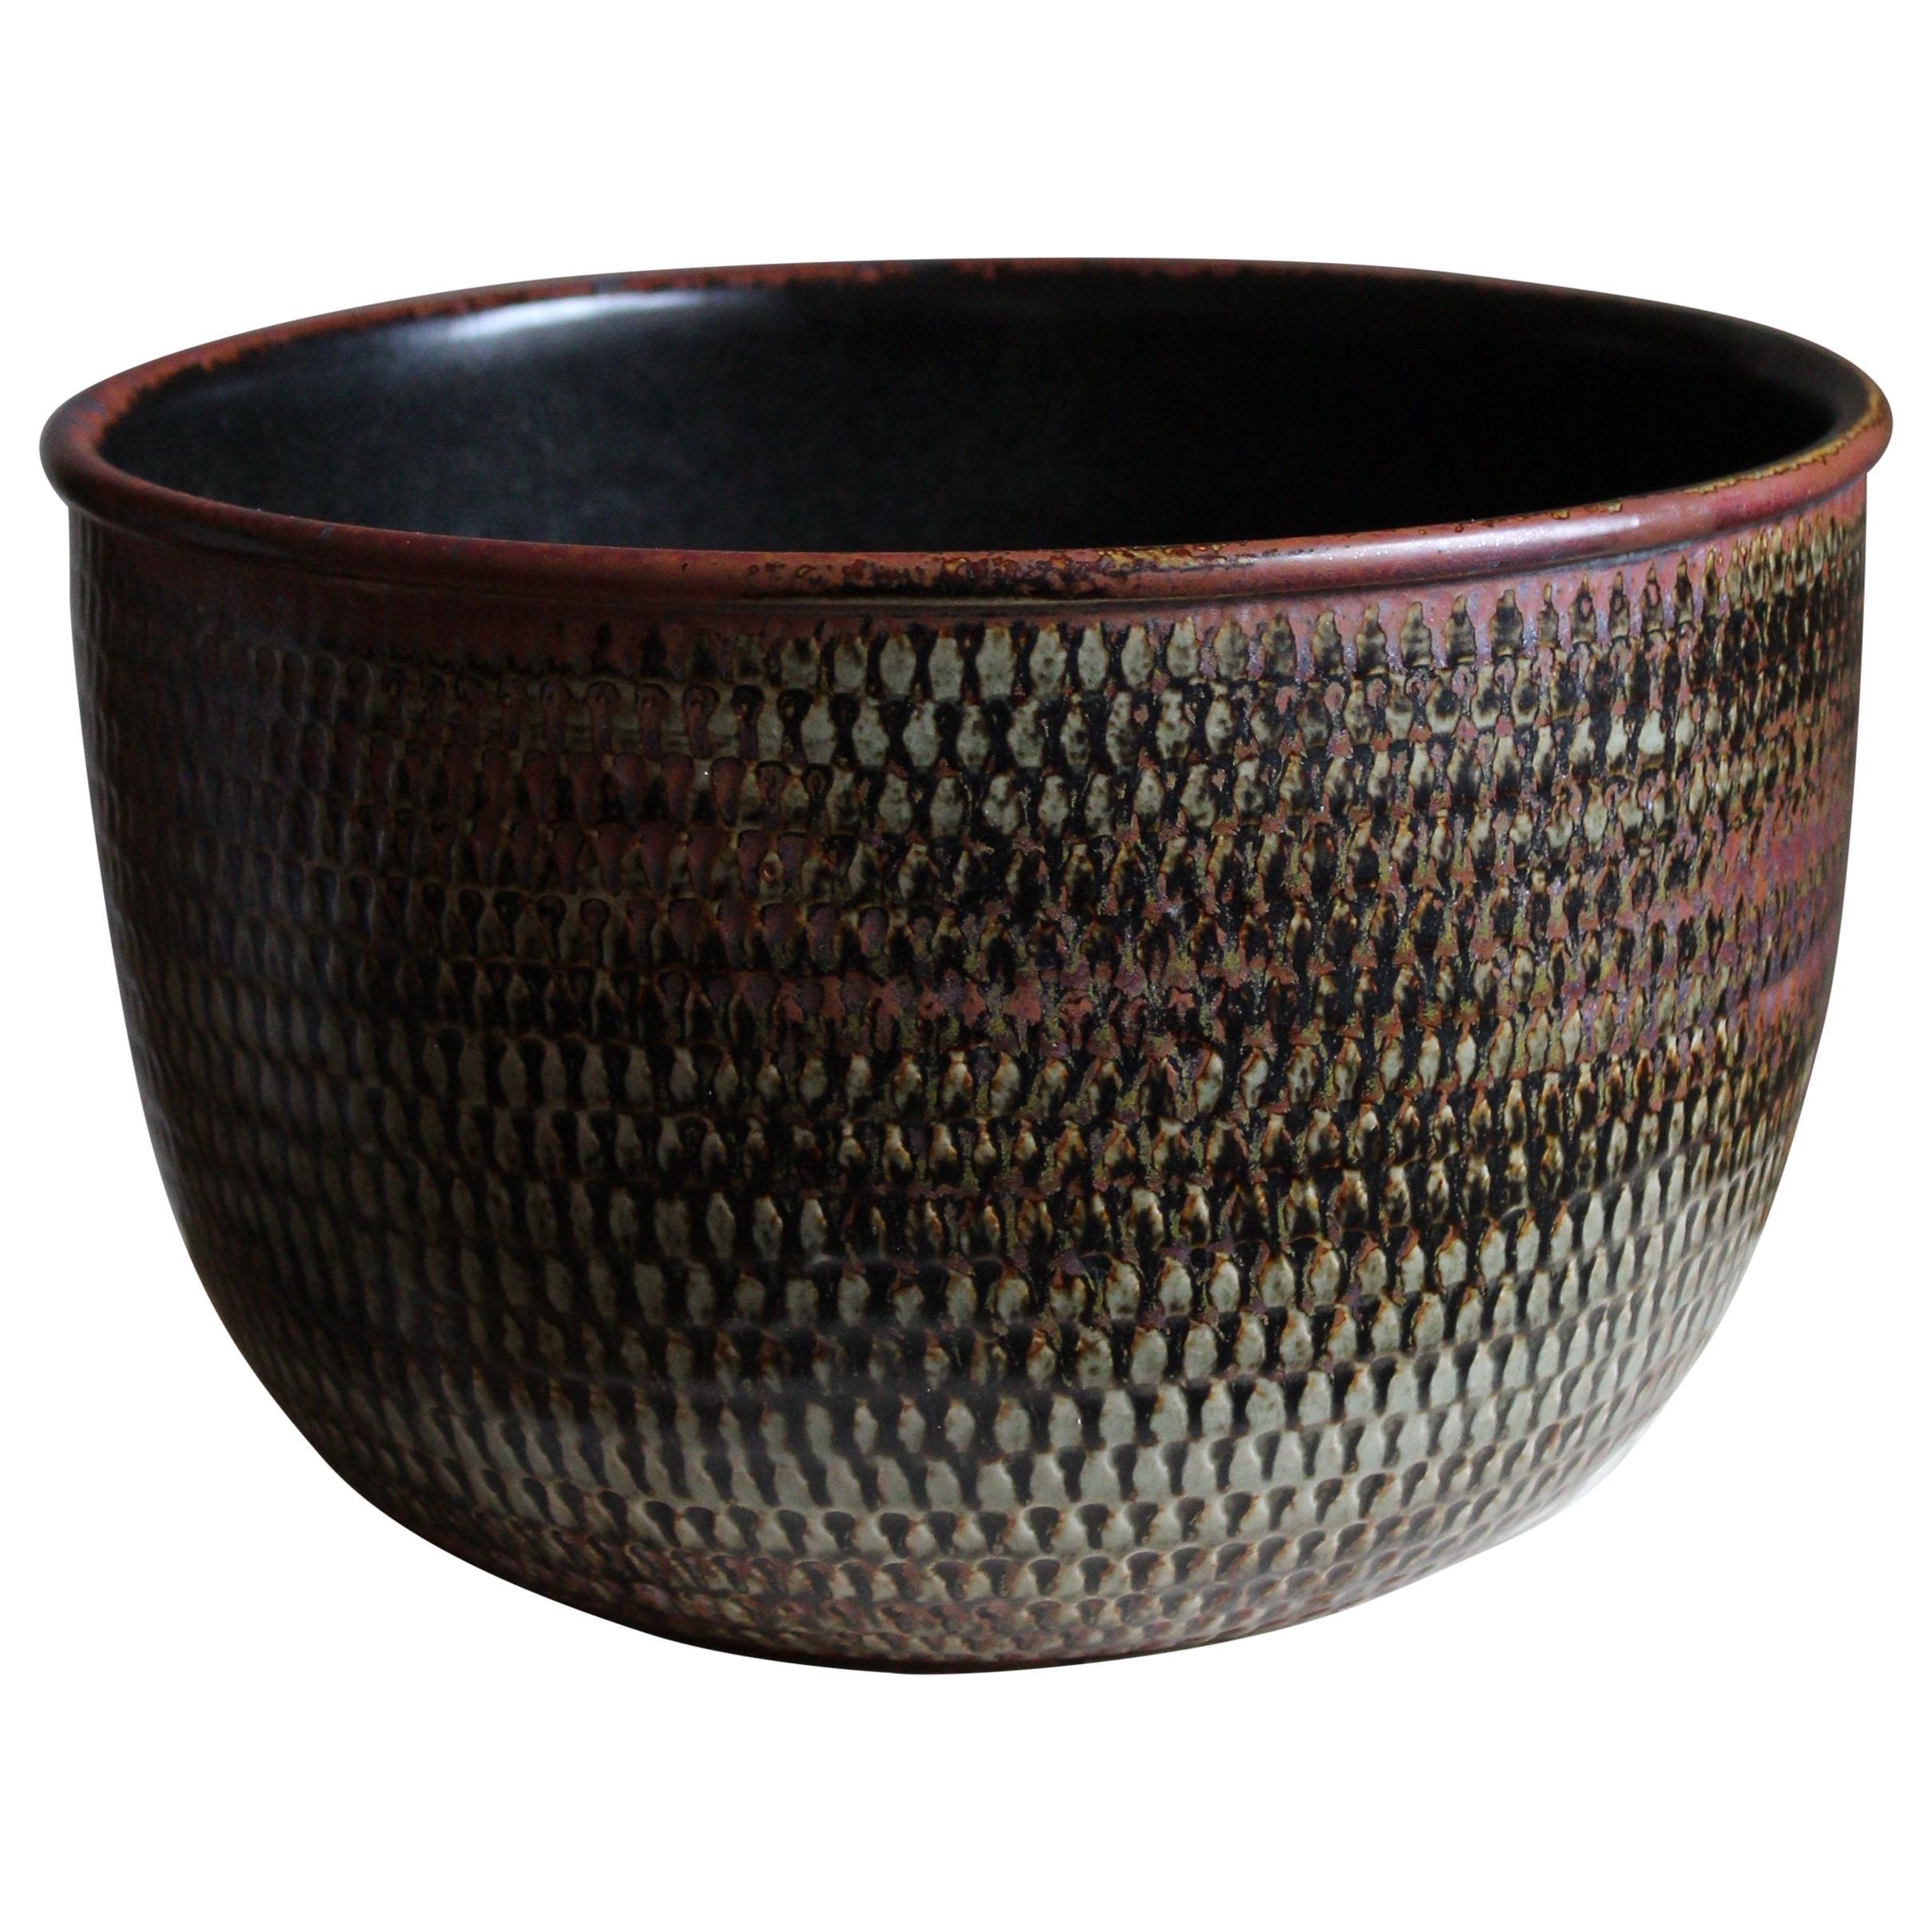 Stig Lindberg, Unique Sizable Bowl, Glazed Stoneware, Gustavsberg, Sweden, 1960s